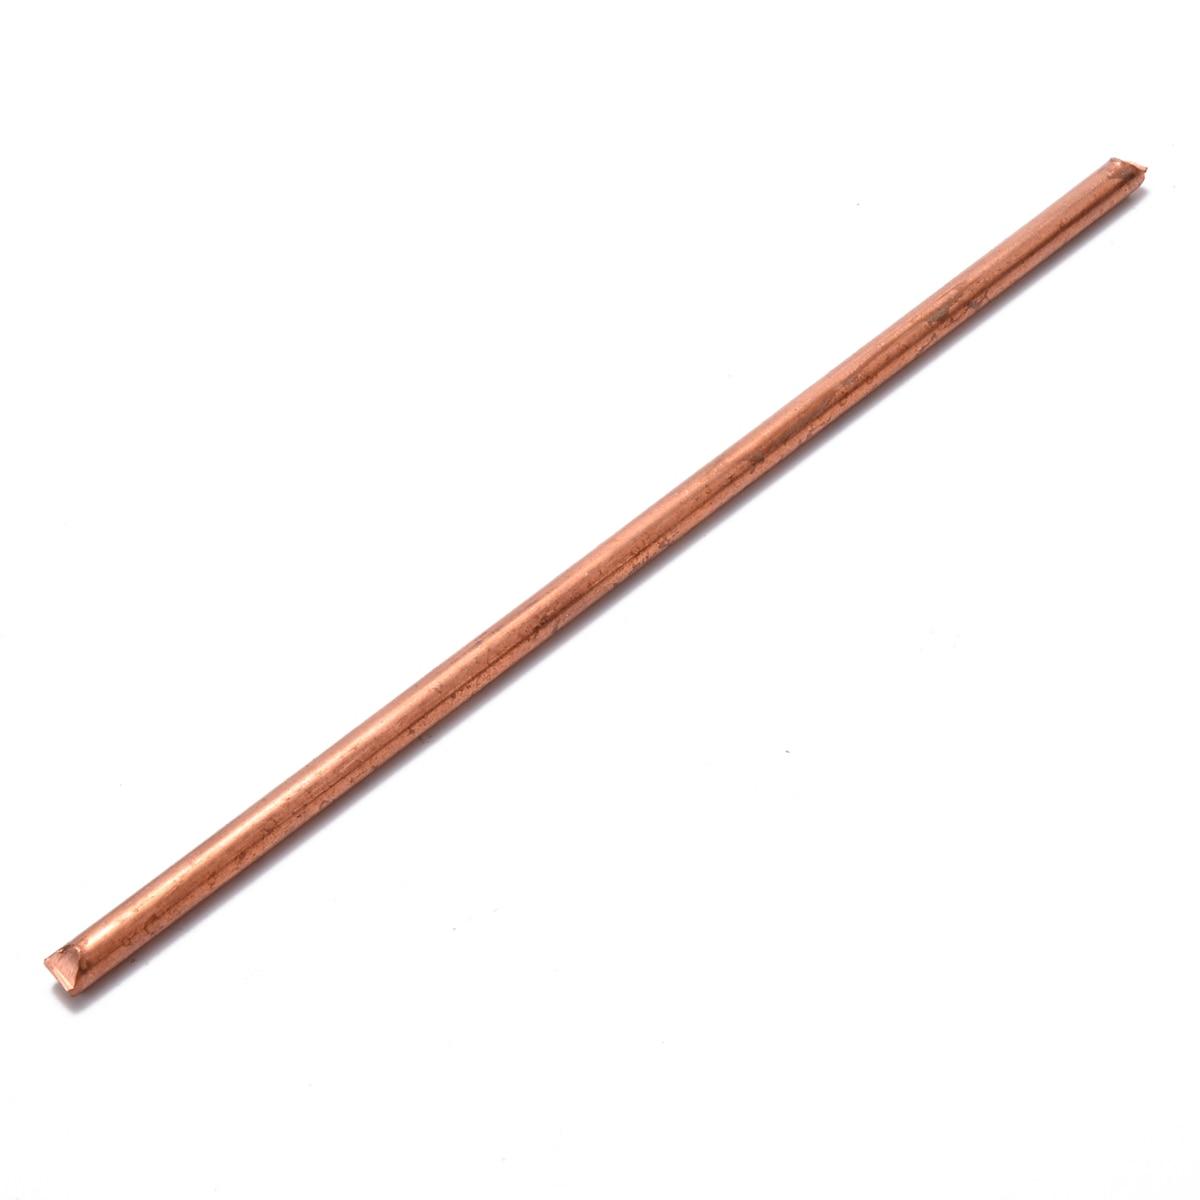 1 varilla de cobre sólido 99.9% puro Mayitr barra de cobre 200mm diámetro de 6mm para aparatos eléctricos